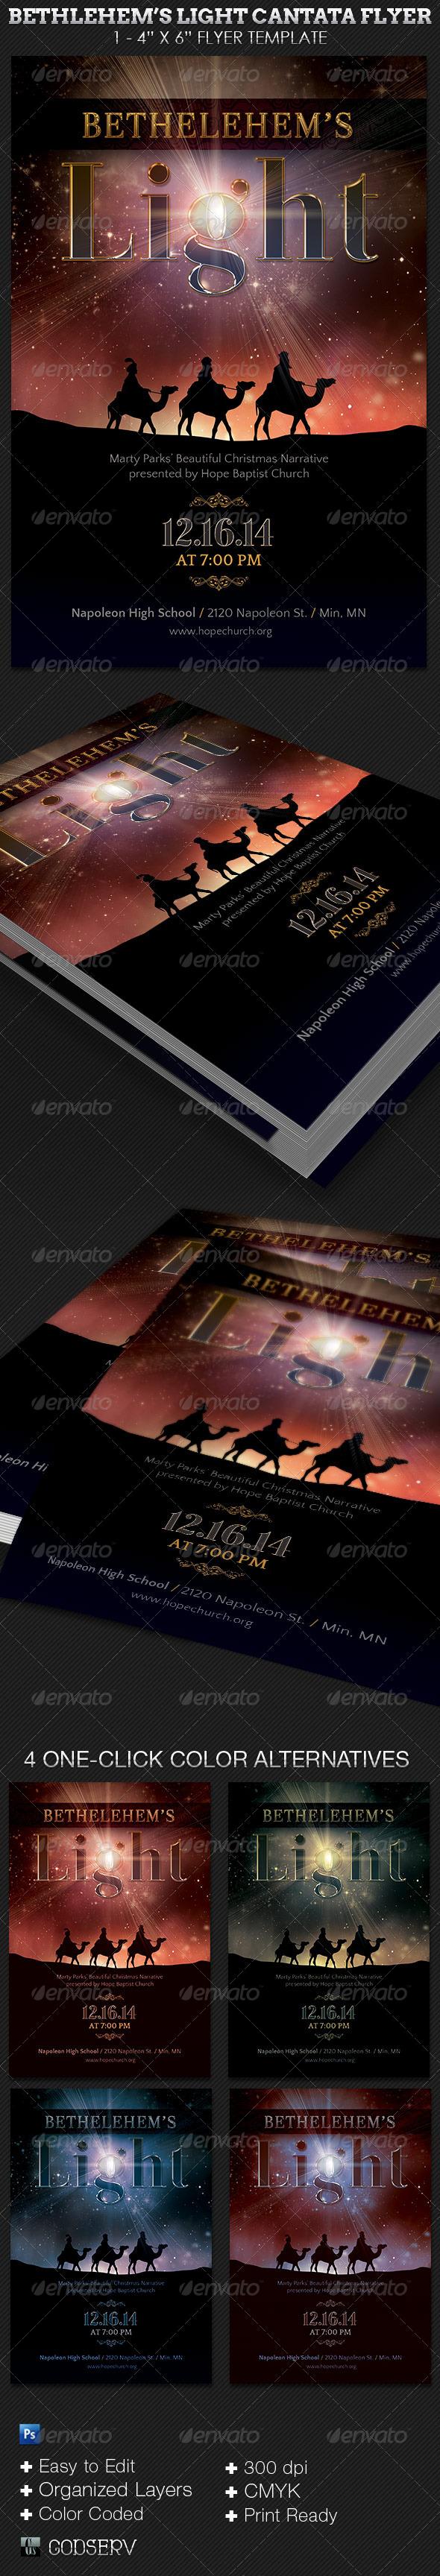 Bethlehem's Light Cantata Flyer Template  - Church Flyers